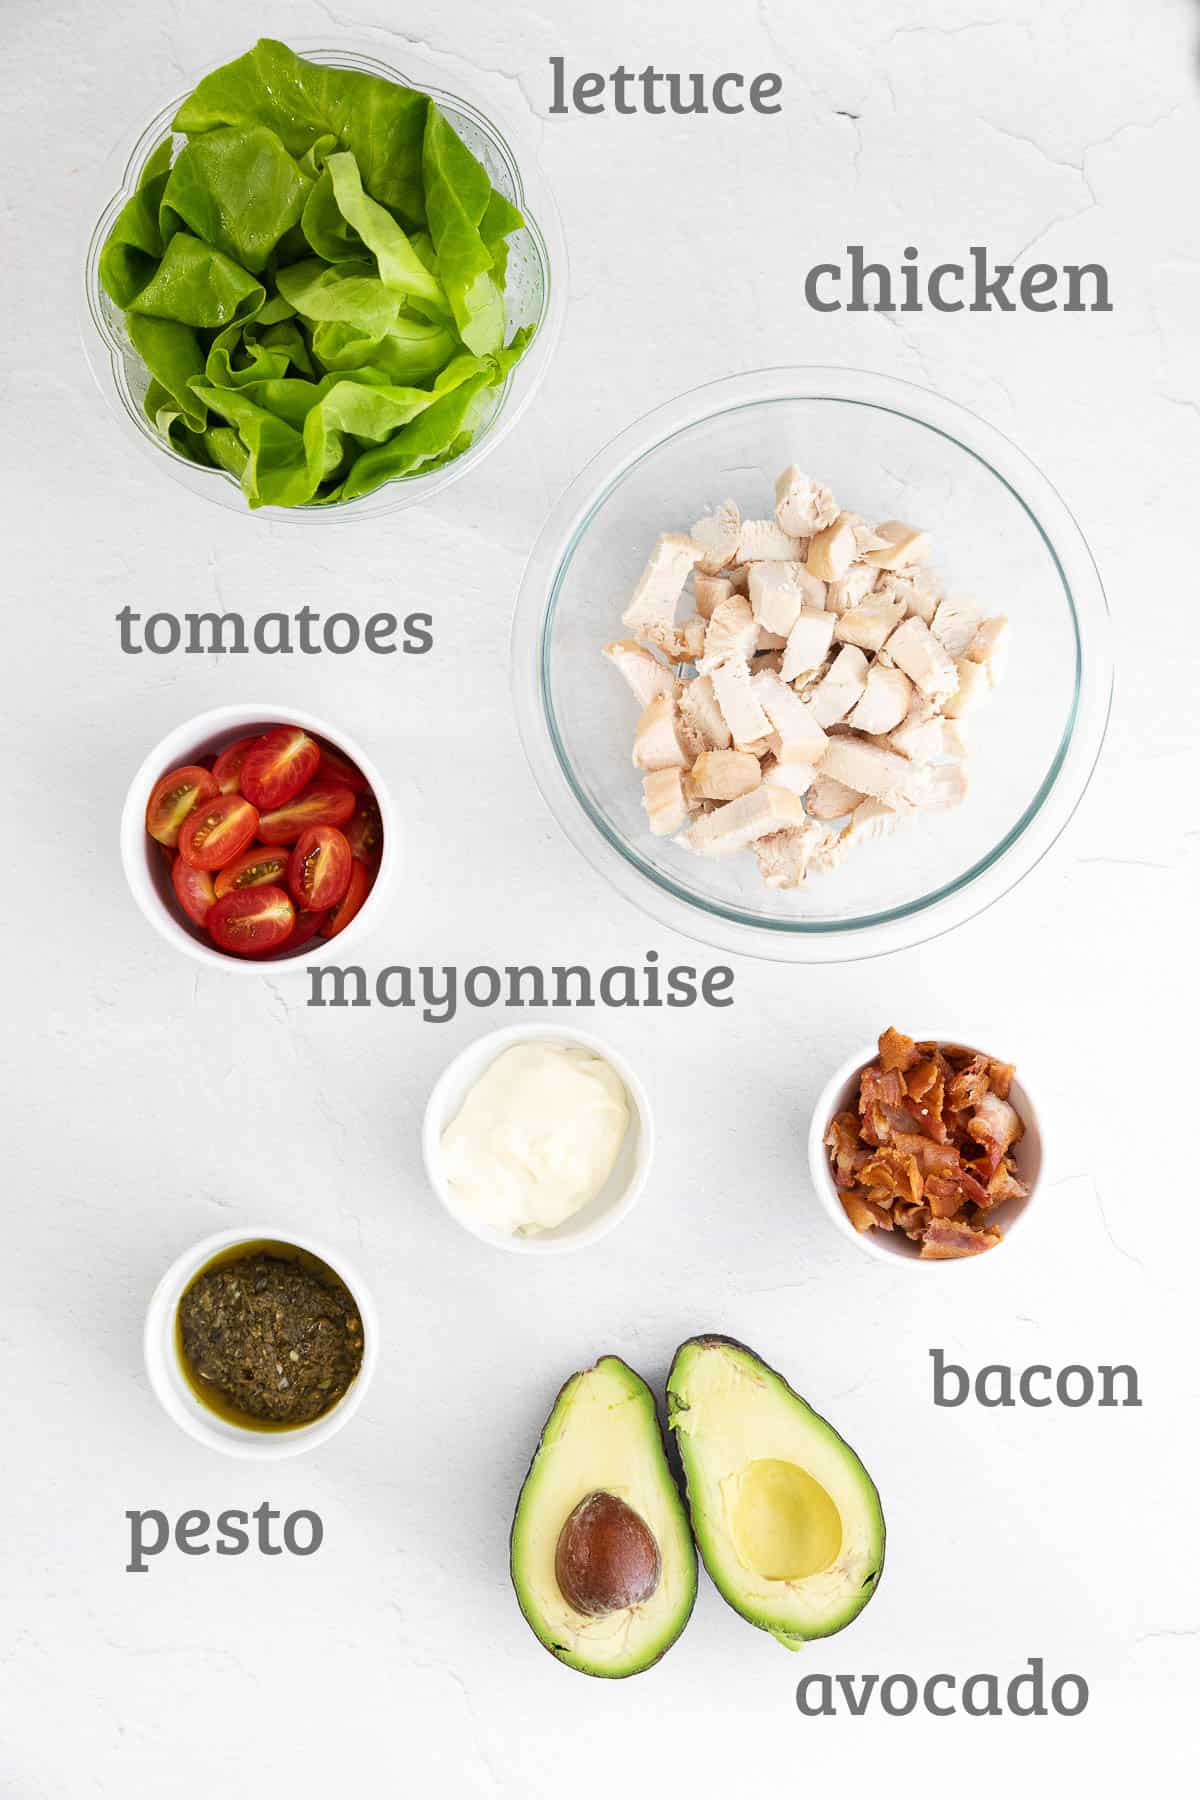 Ingredients for pesto chicken salad - chicken, bacon, avocado, tomato, mayonnaise, pesto